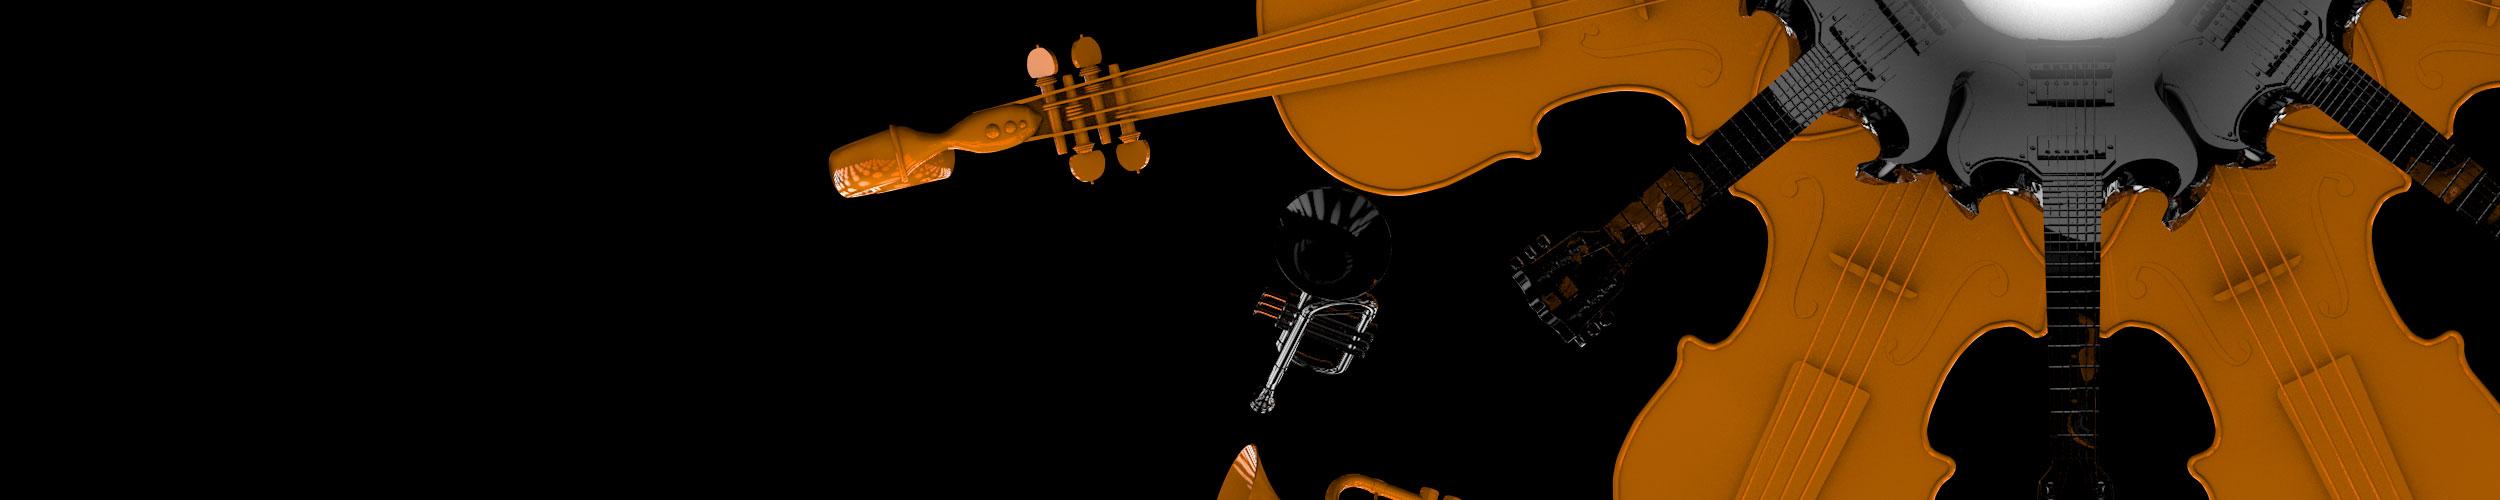 SYMPHONY hybrid orchestra for serum